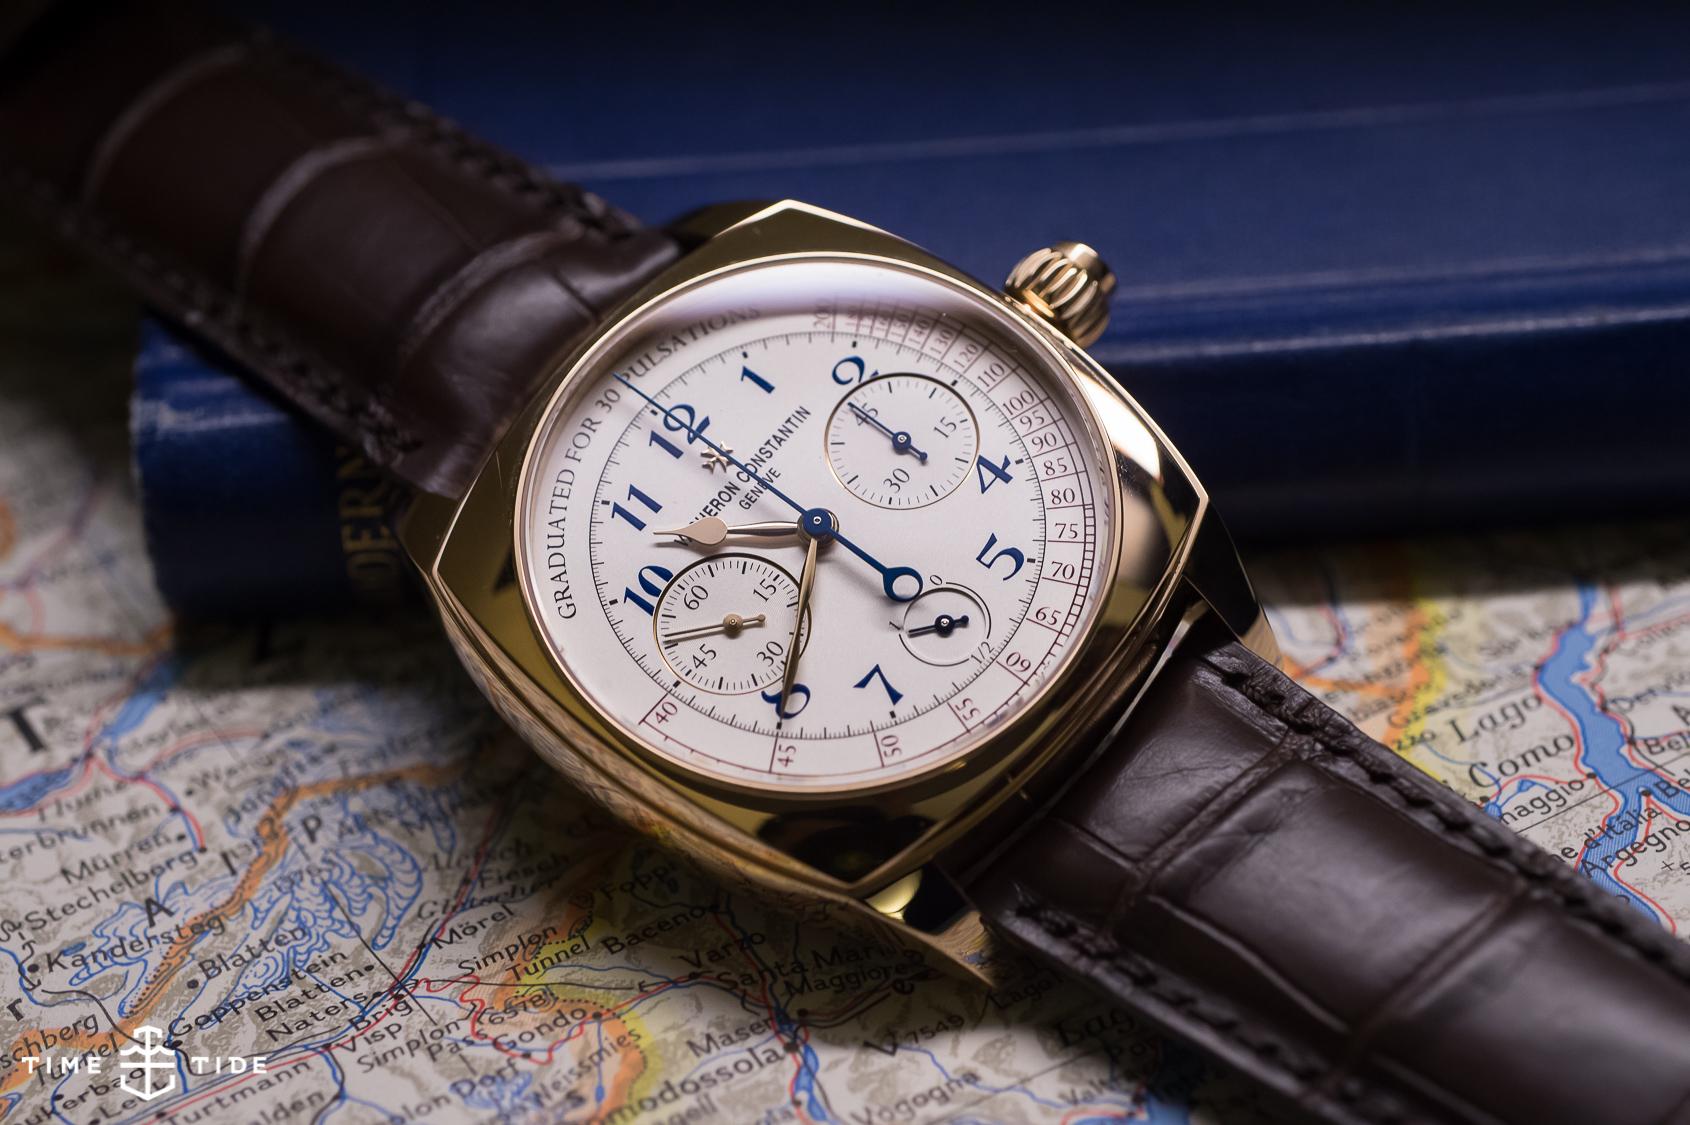 Vacheron Constantin's Creative Director Christian Selmoni on harmonious watch design